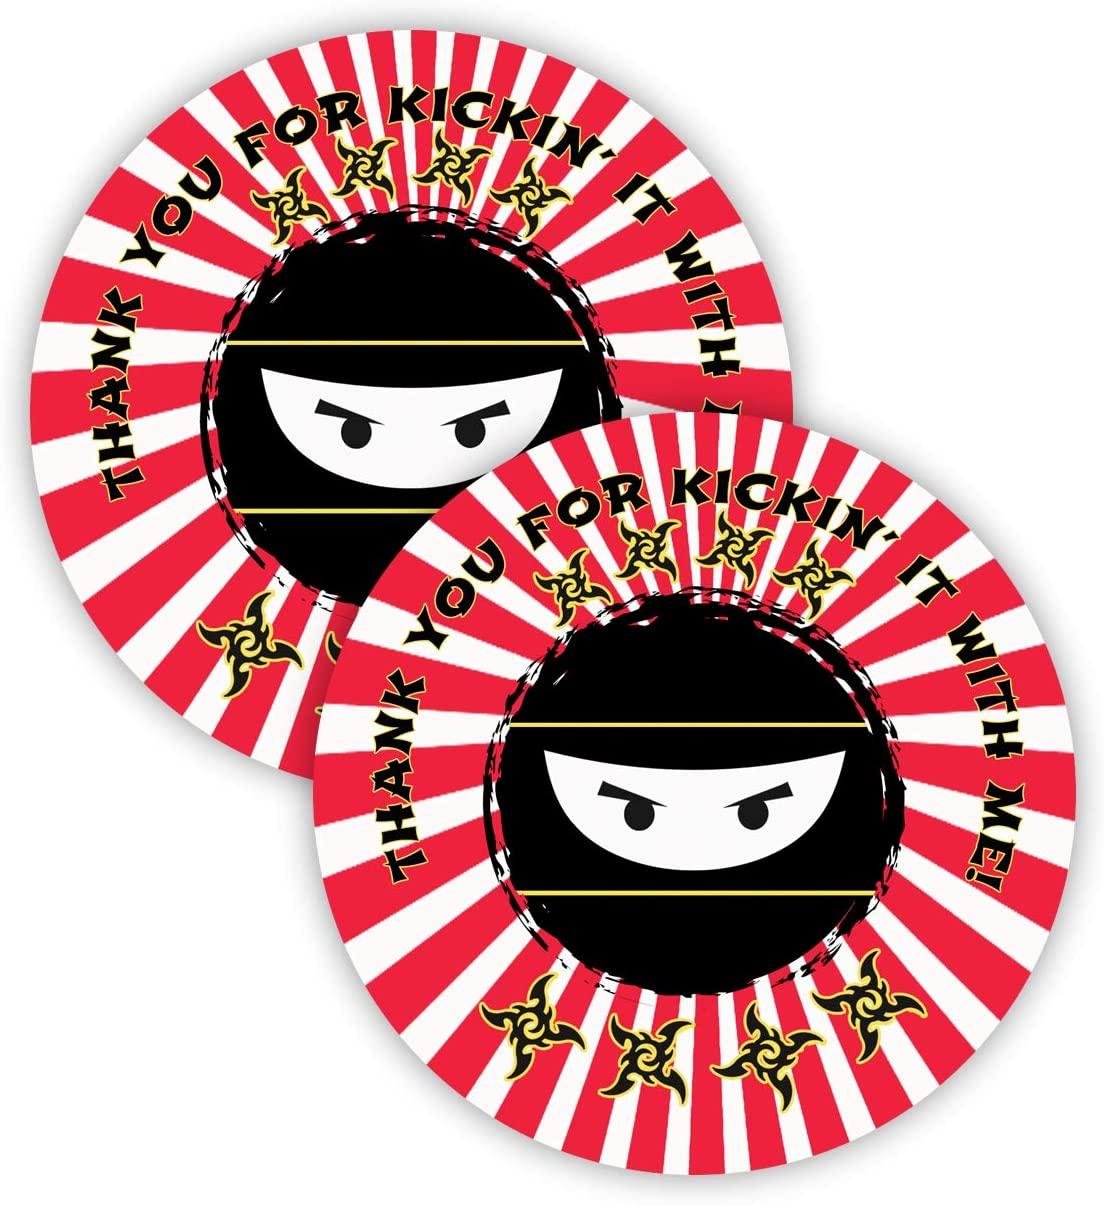 POP parties Ninja Party Favor Stickers - 40 Favor Bag Stickers - Ninja Thank You Tag - Ninja Party Supplies - Ninja Party Decorations